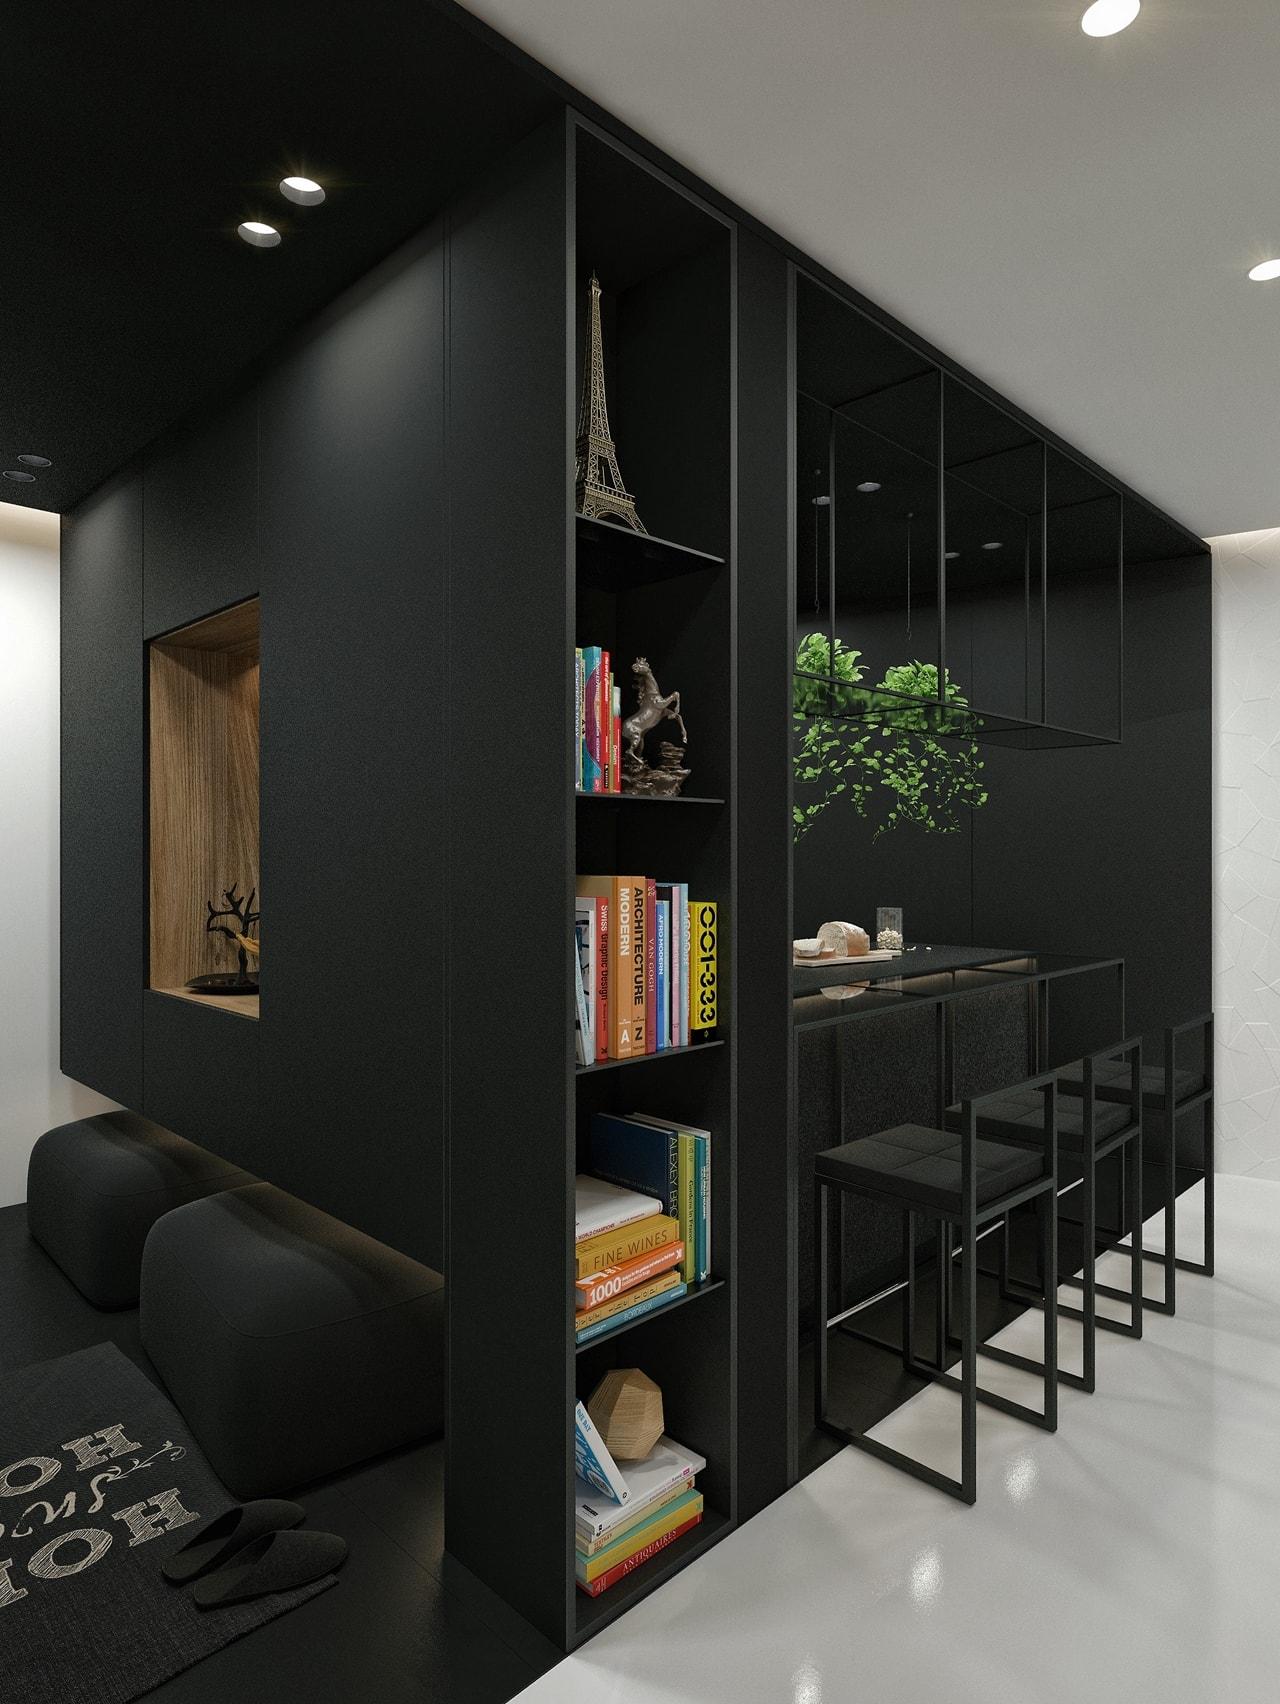 Black kitchen furniture by ID White